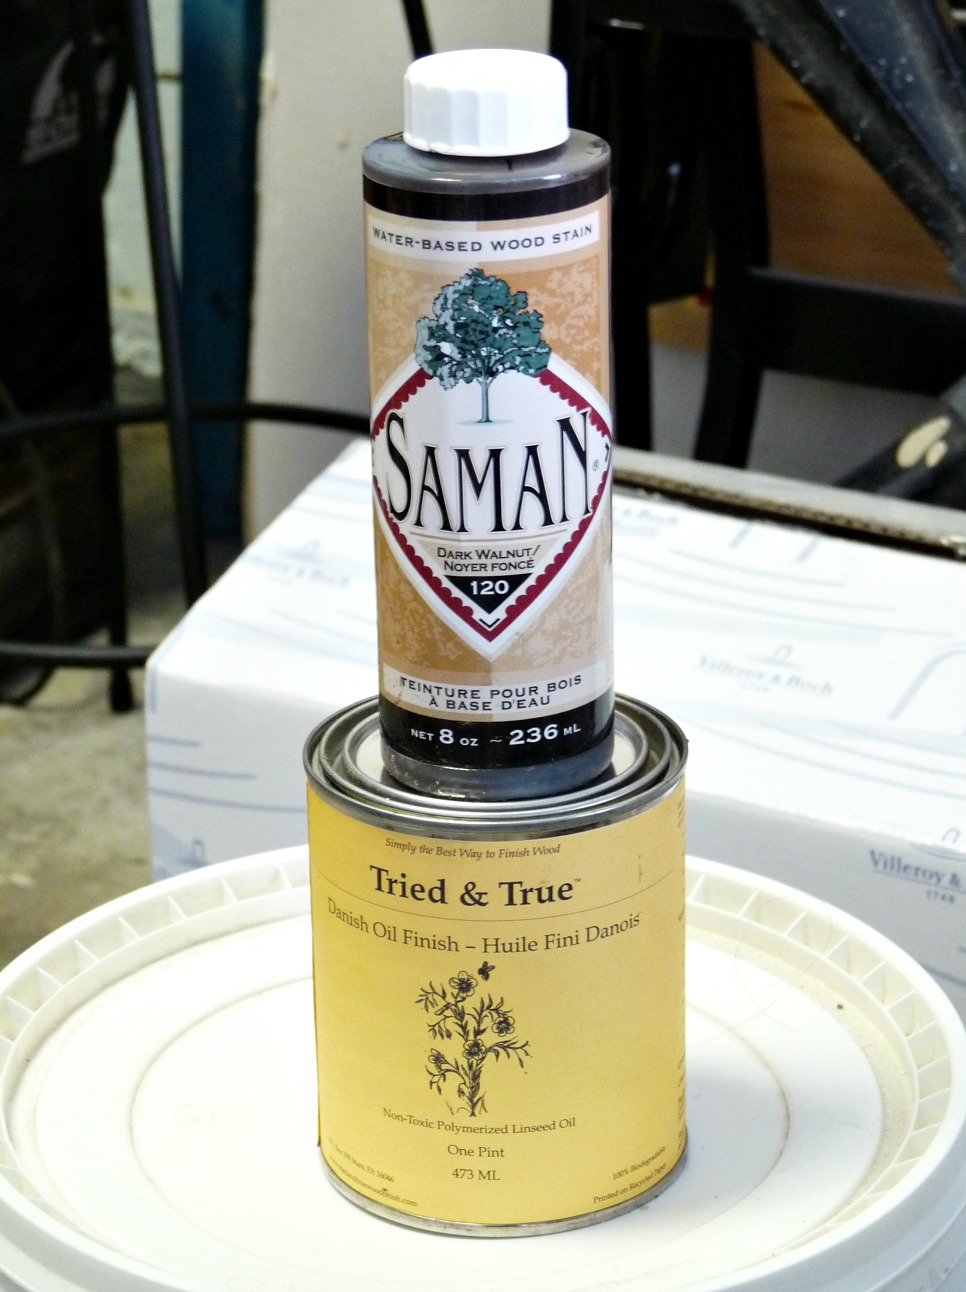 Tried and True Danish Oil; Saman Brand Stain Dark Walnut